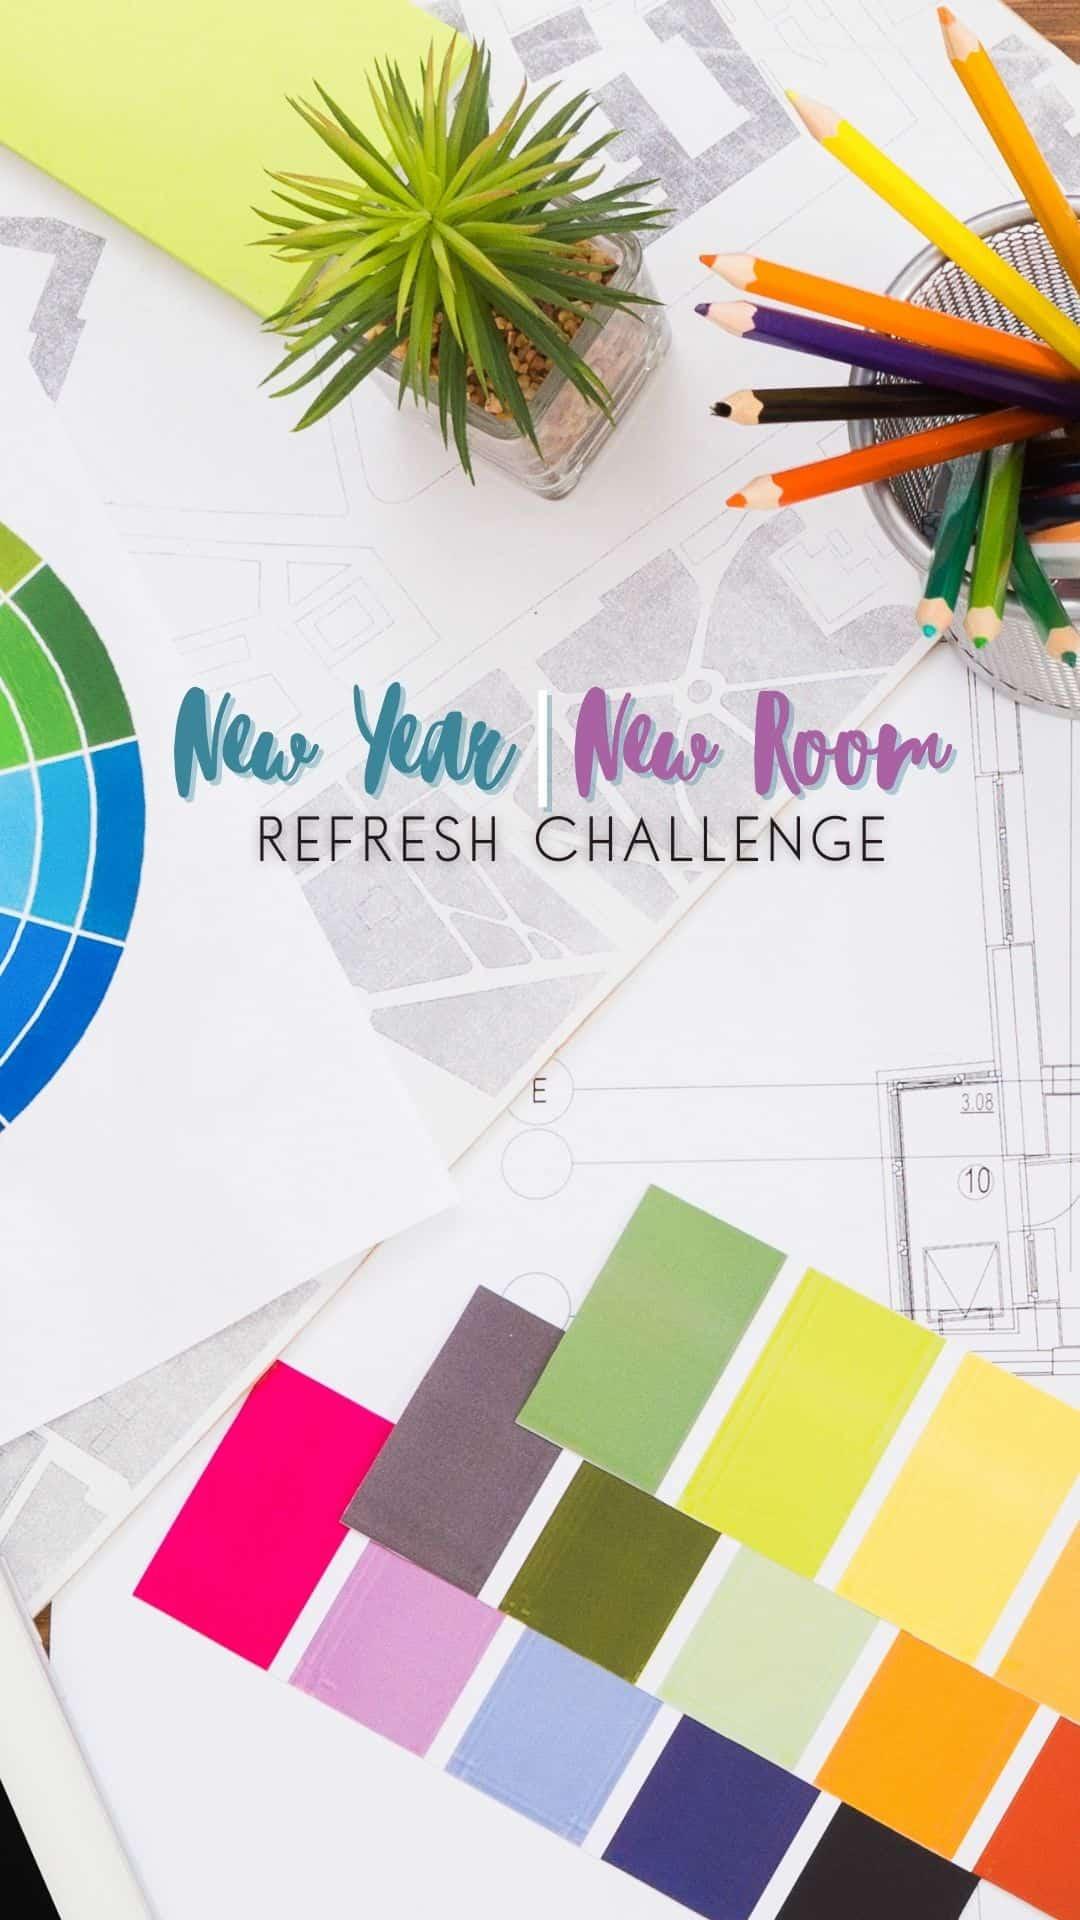 New Year New Room Refresh Challenge 2021 Igstory